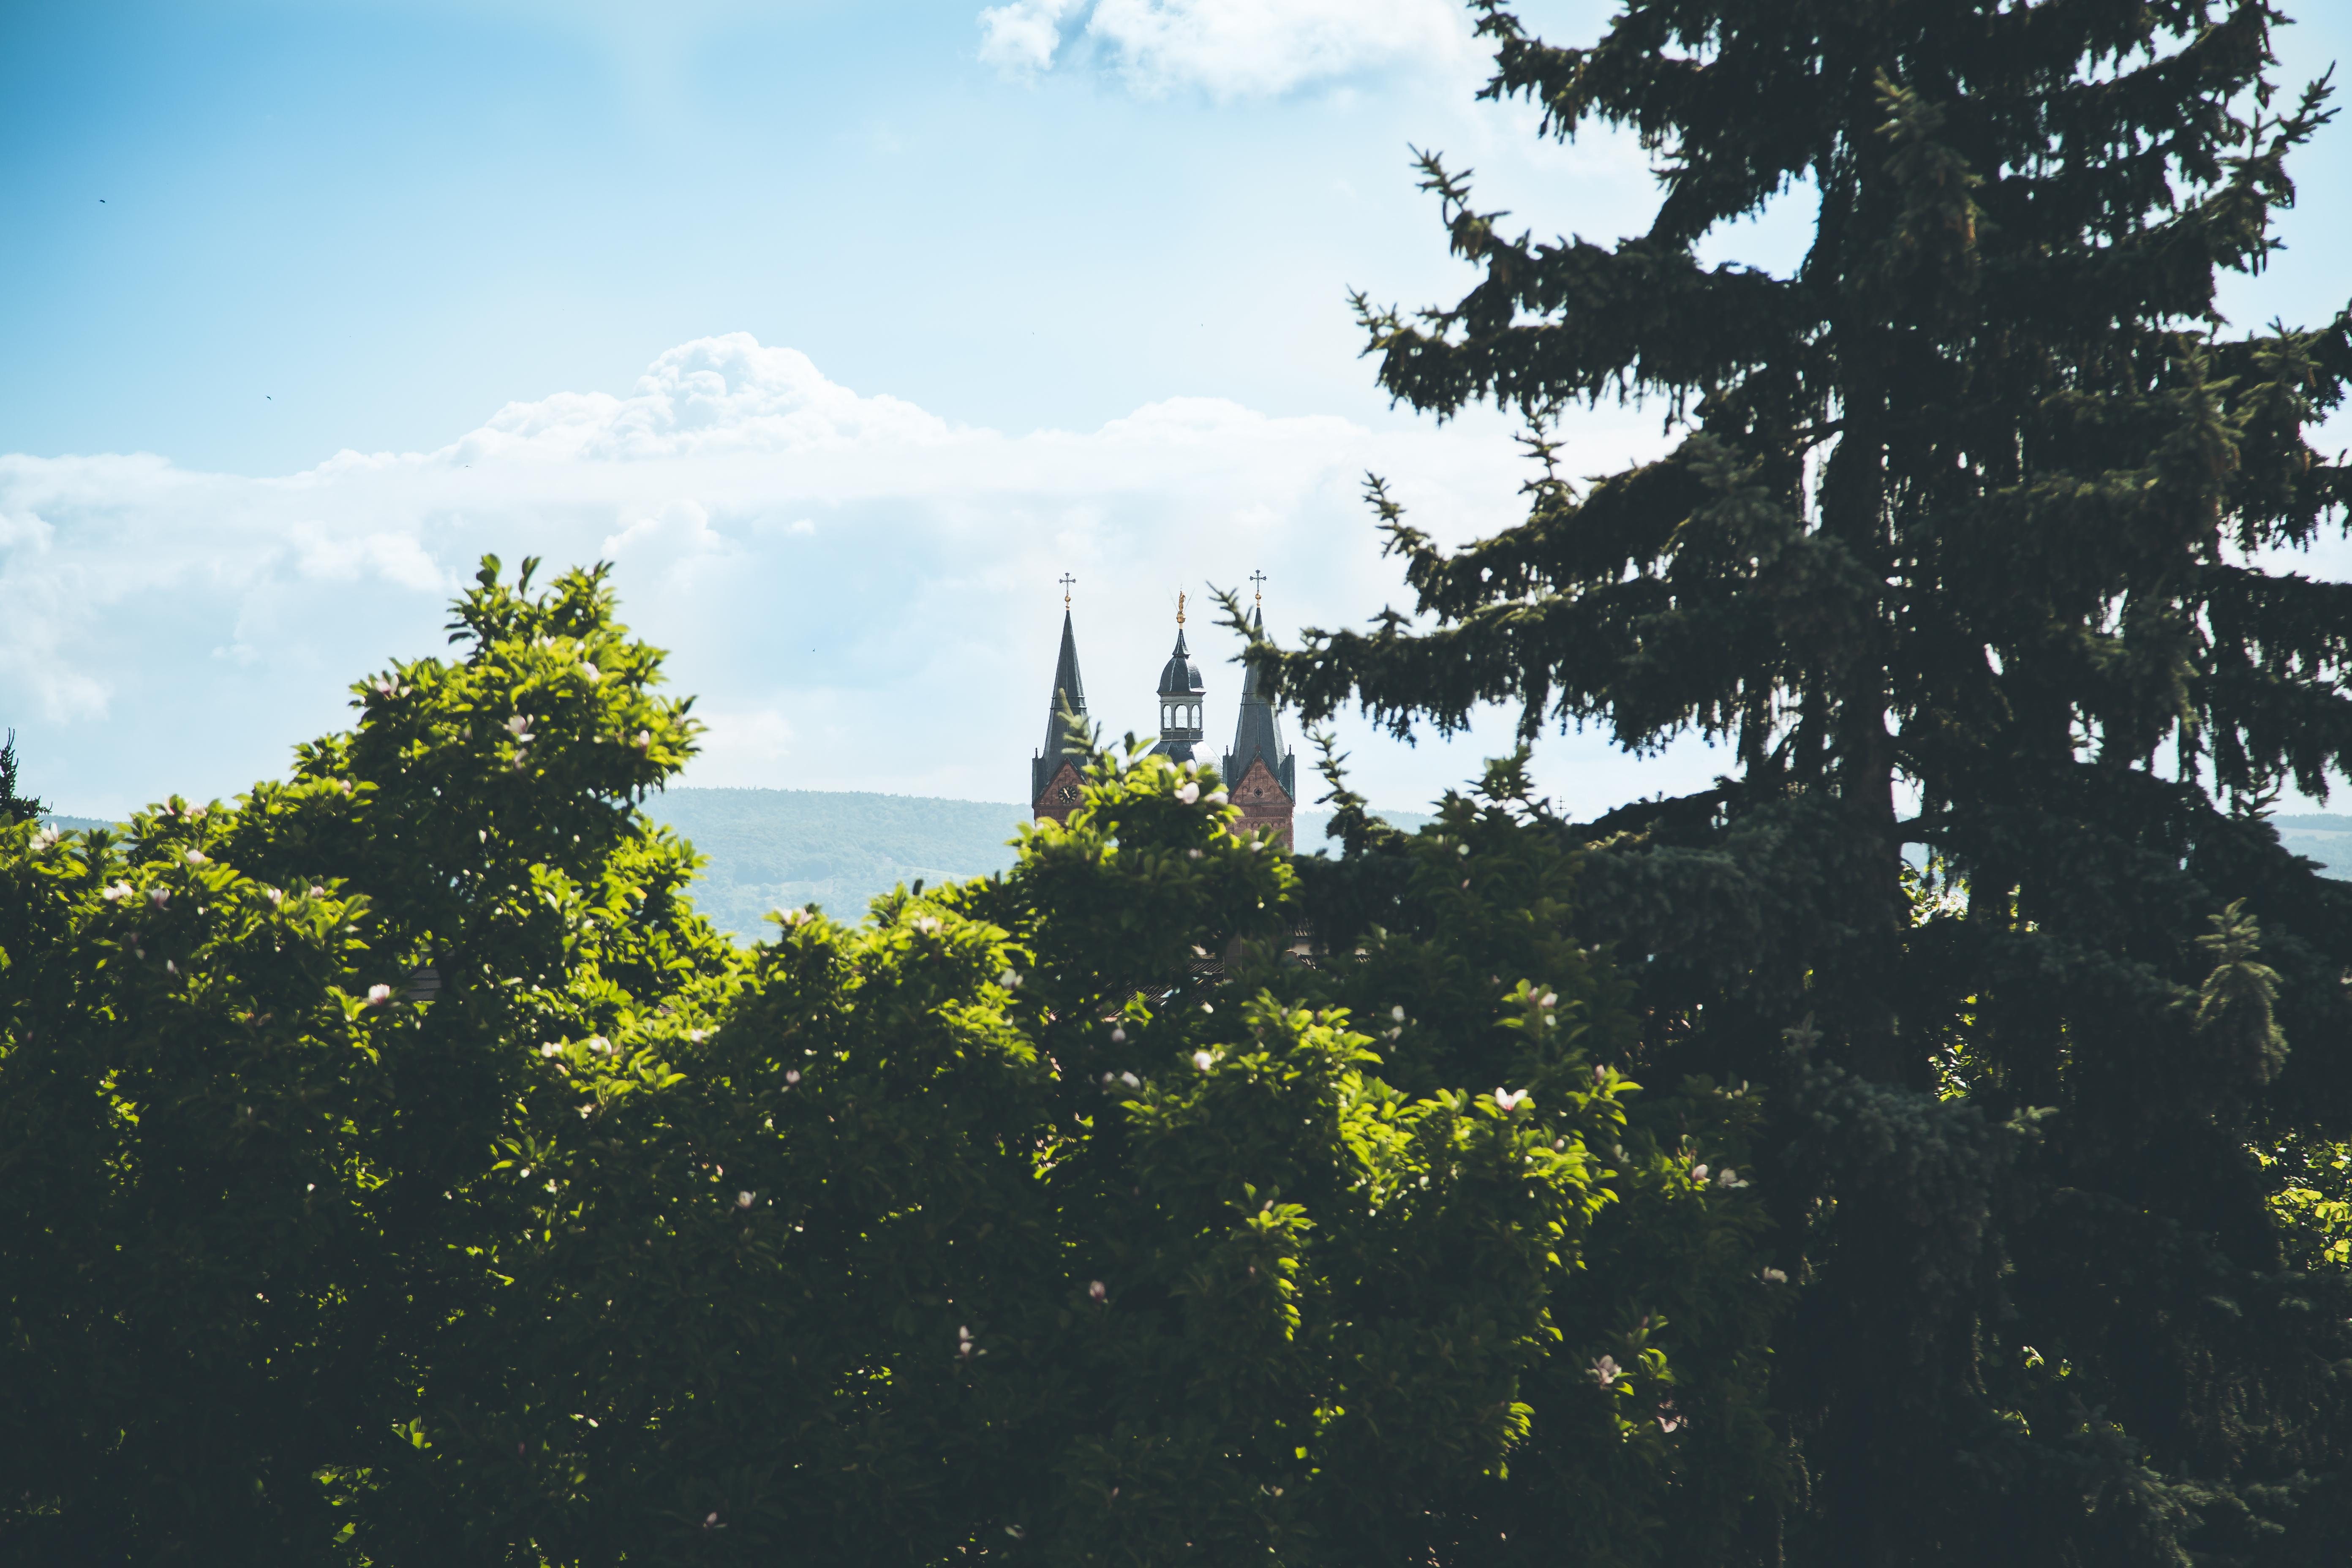 Ausblick auf die Basilika